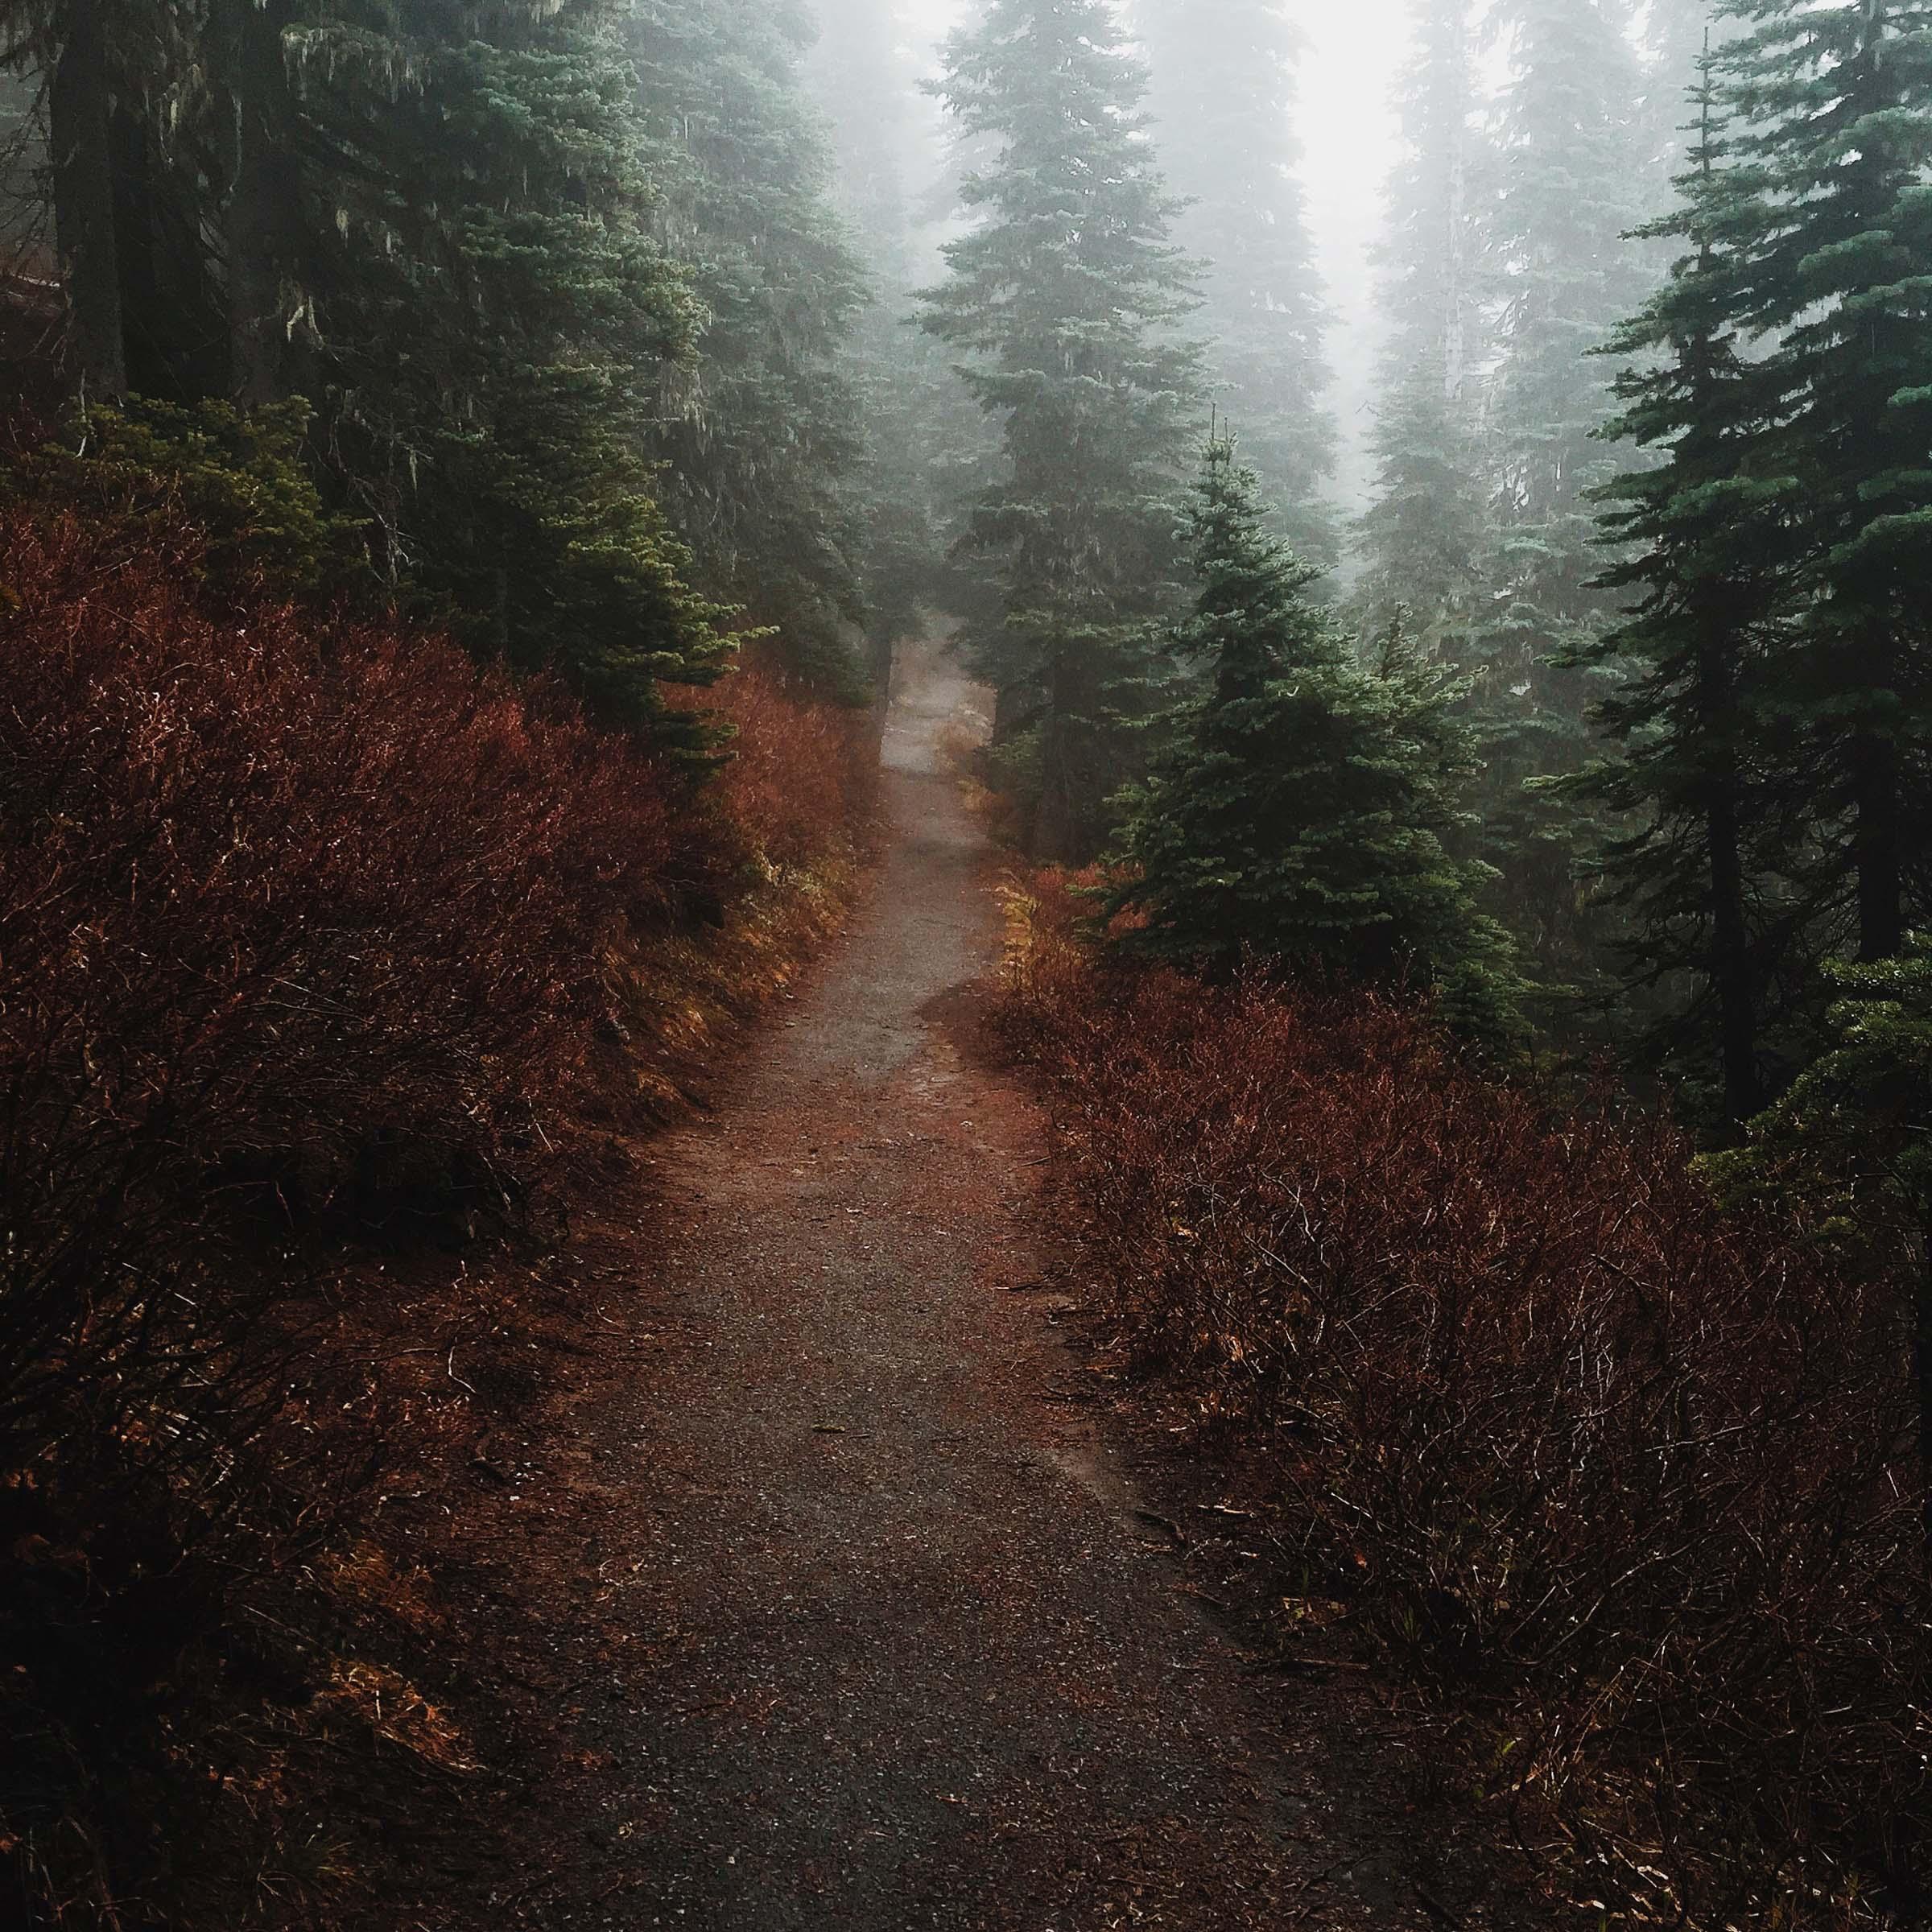 Mount Rainier National Park | Katch Silva